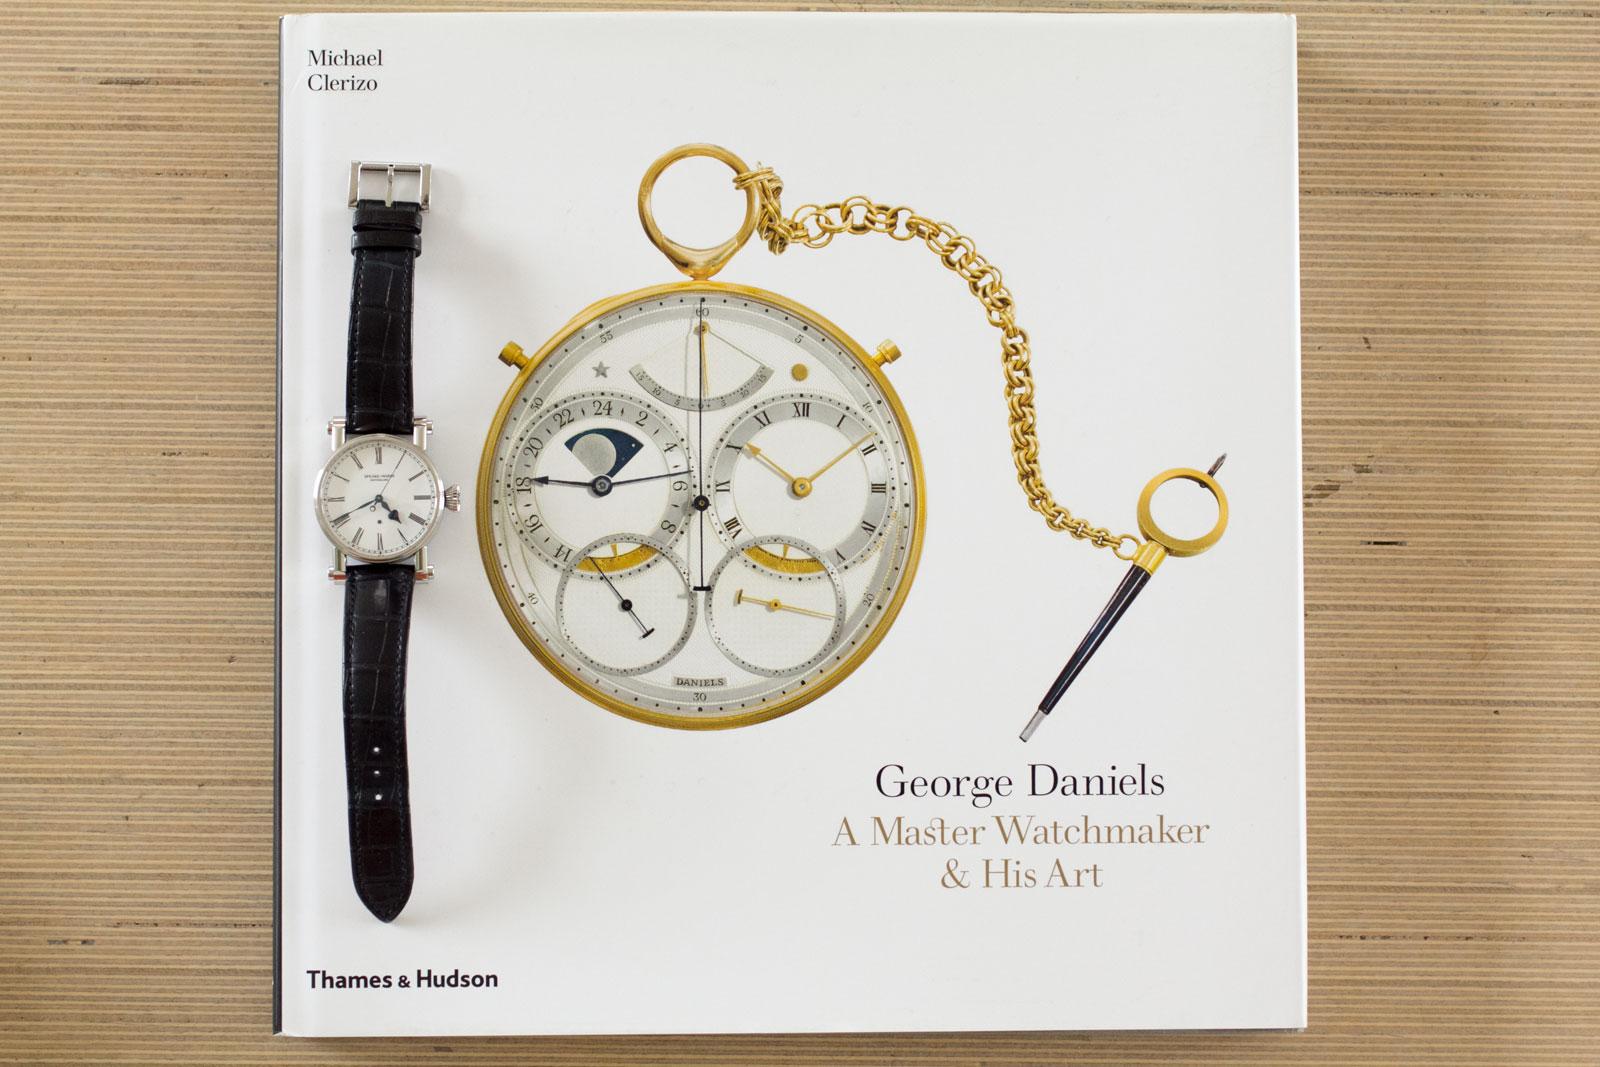 George Daniels book by Michael Clerizo